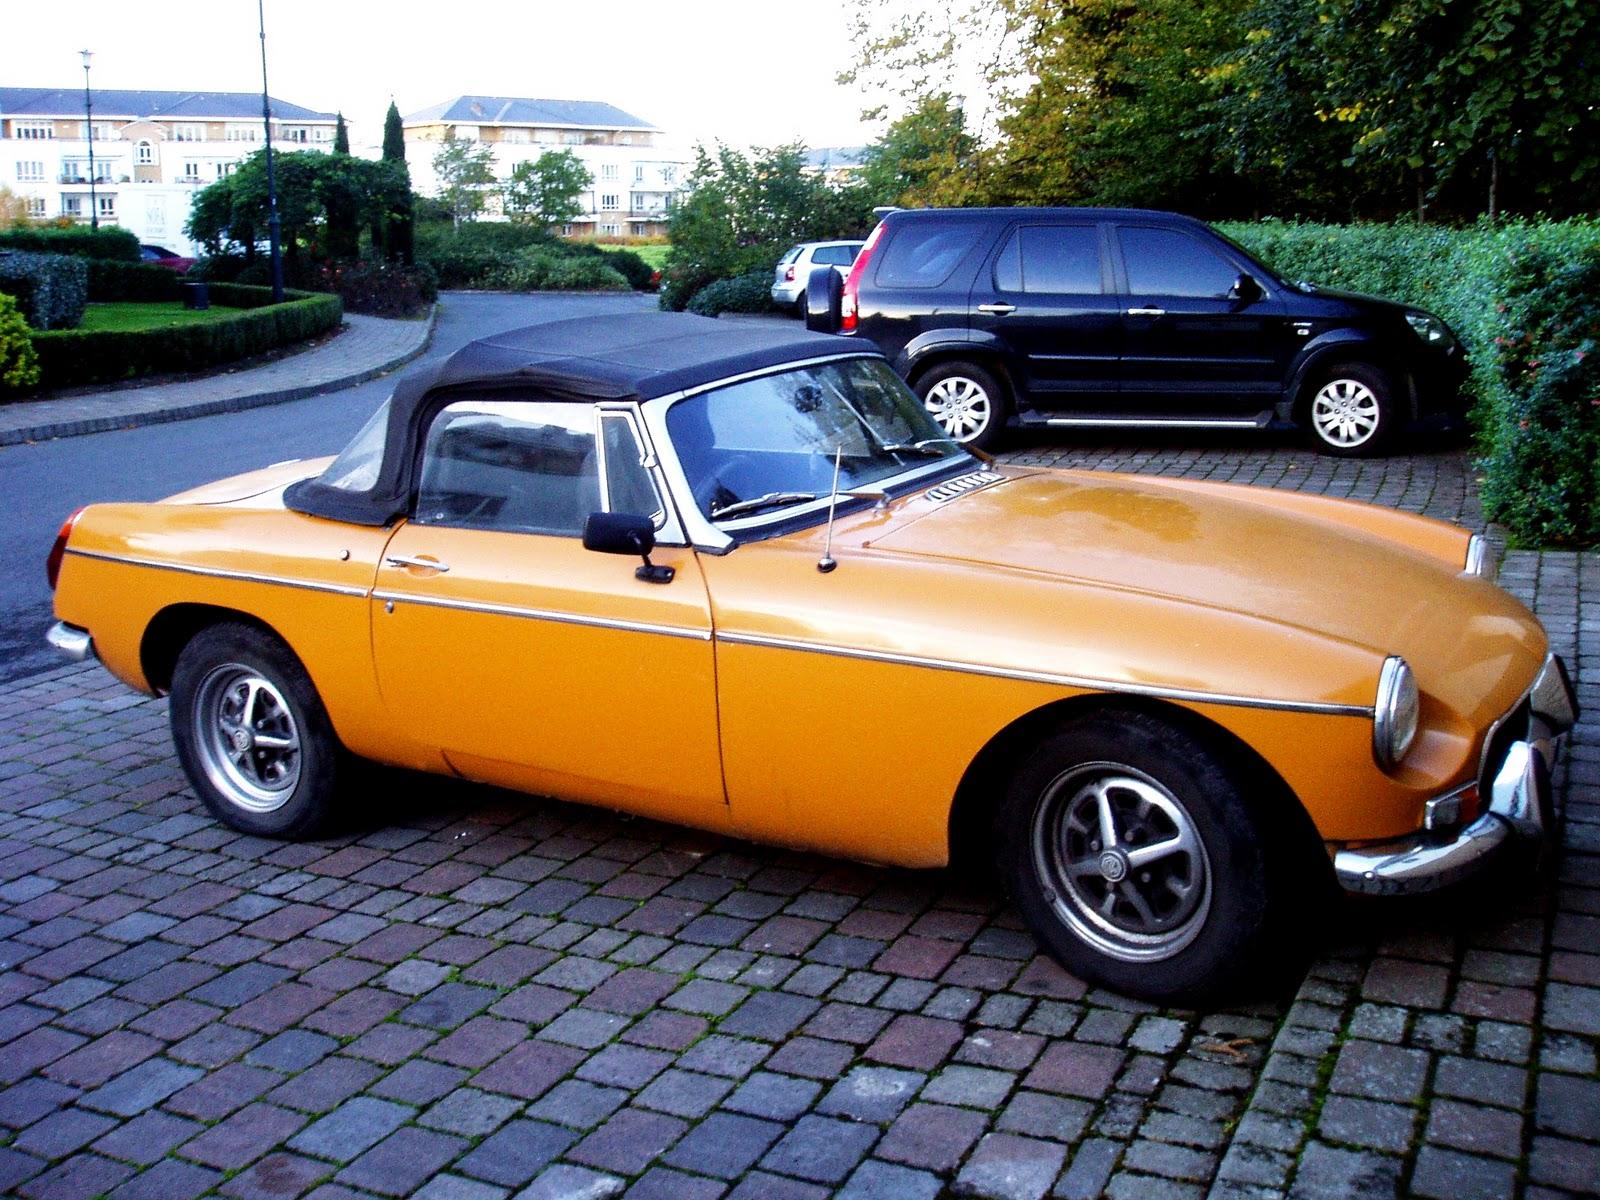 FOLK og RØVERE: very nice cars